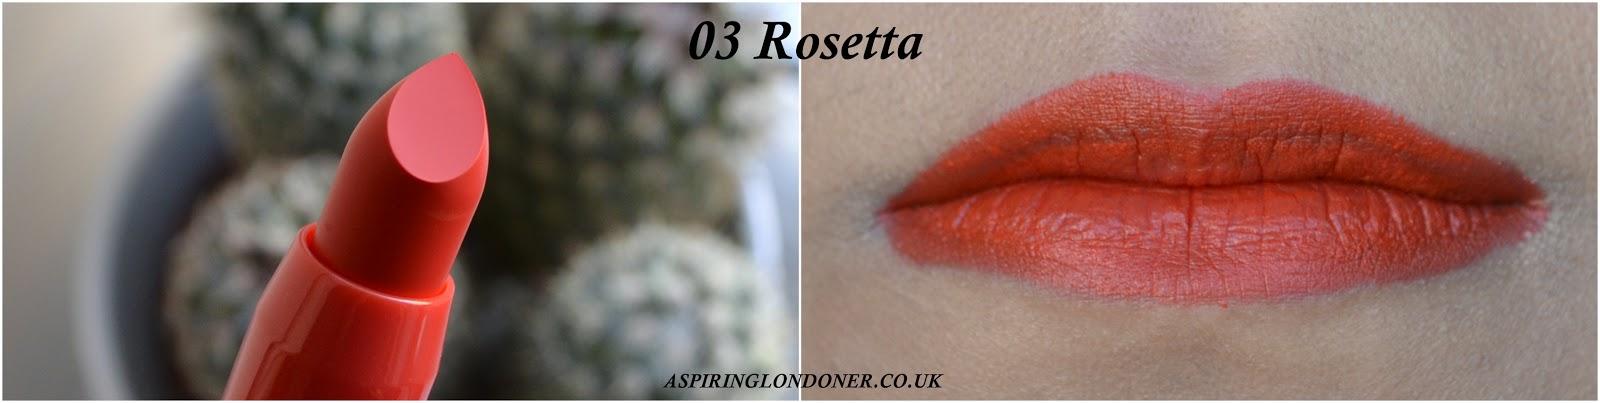 Kiko Cosmetics Frosted Look Lipstick 03 Rosetta Swatch - Aspiring Londoner